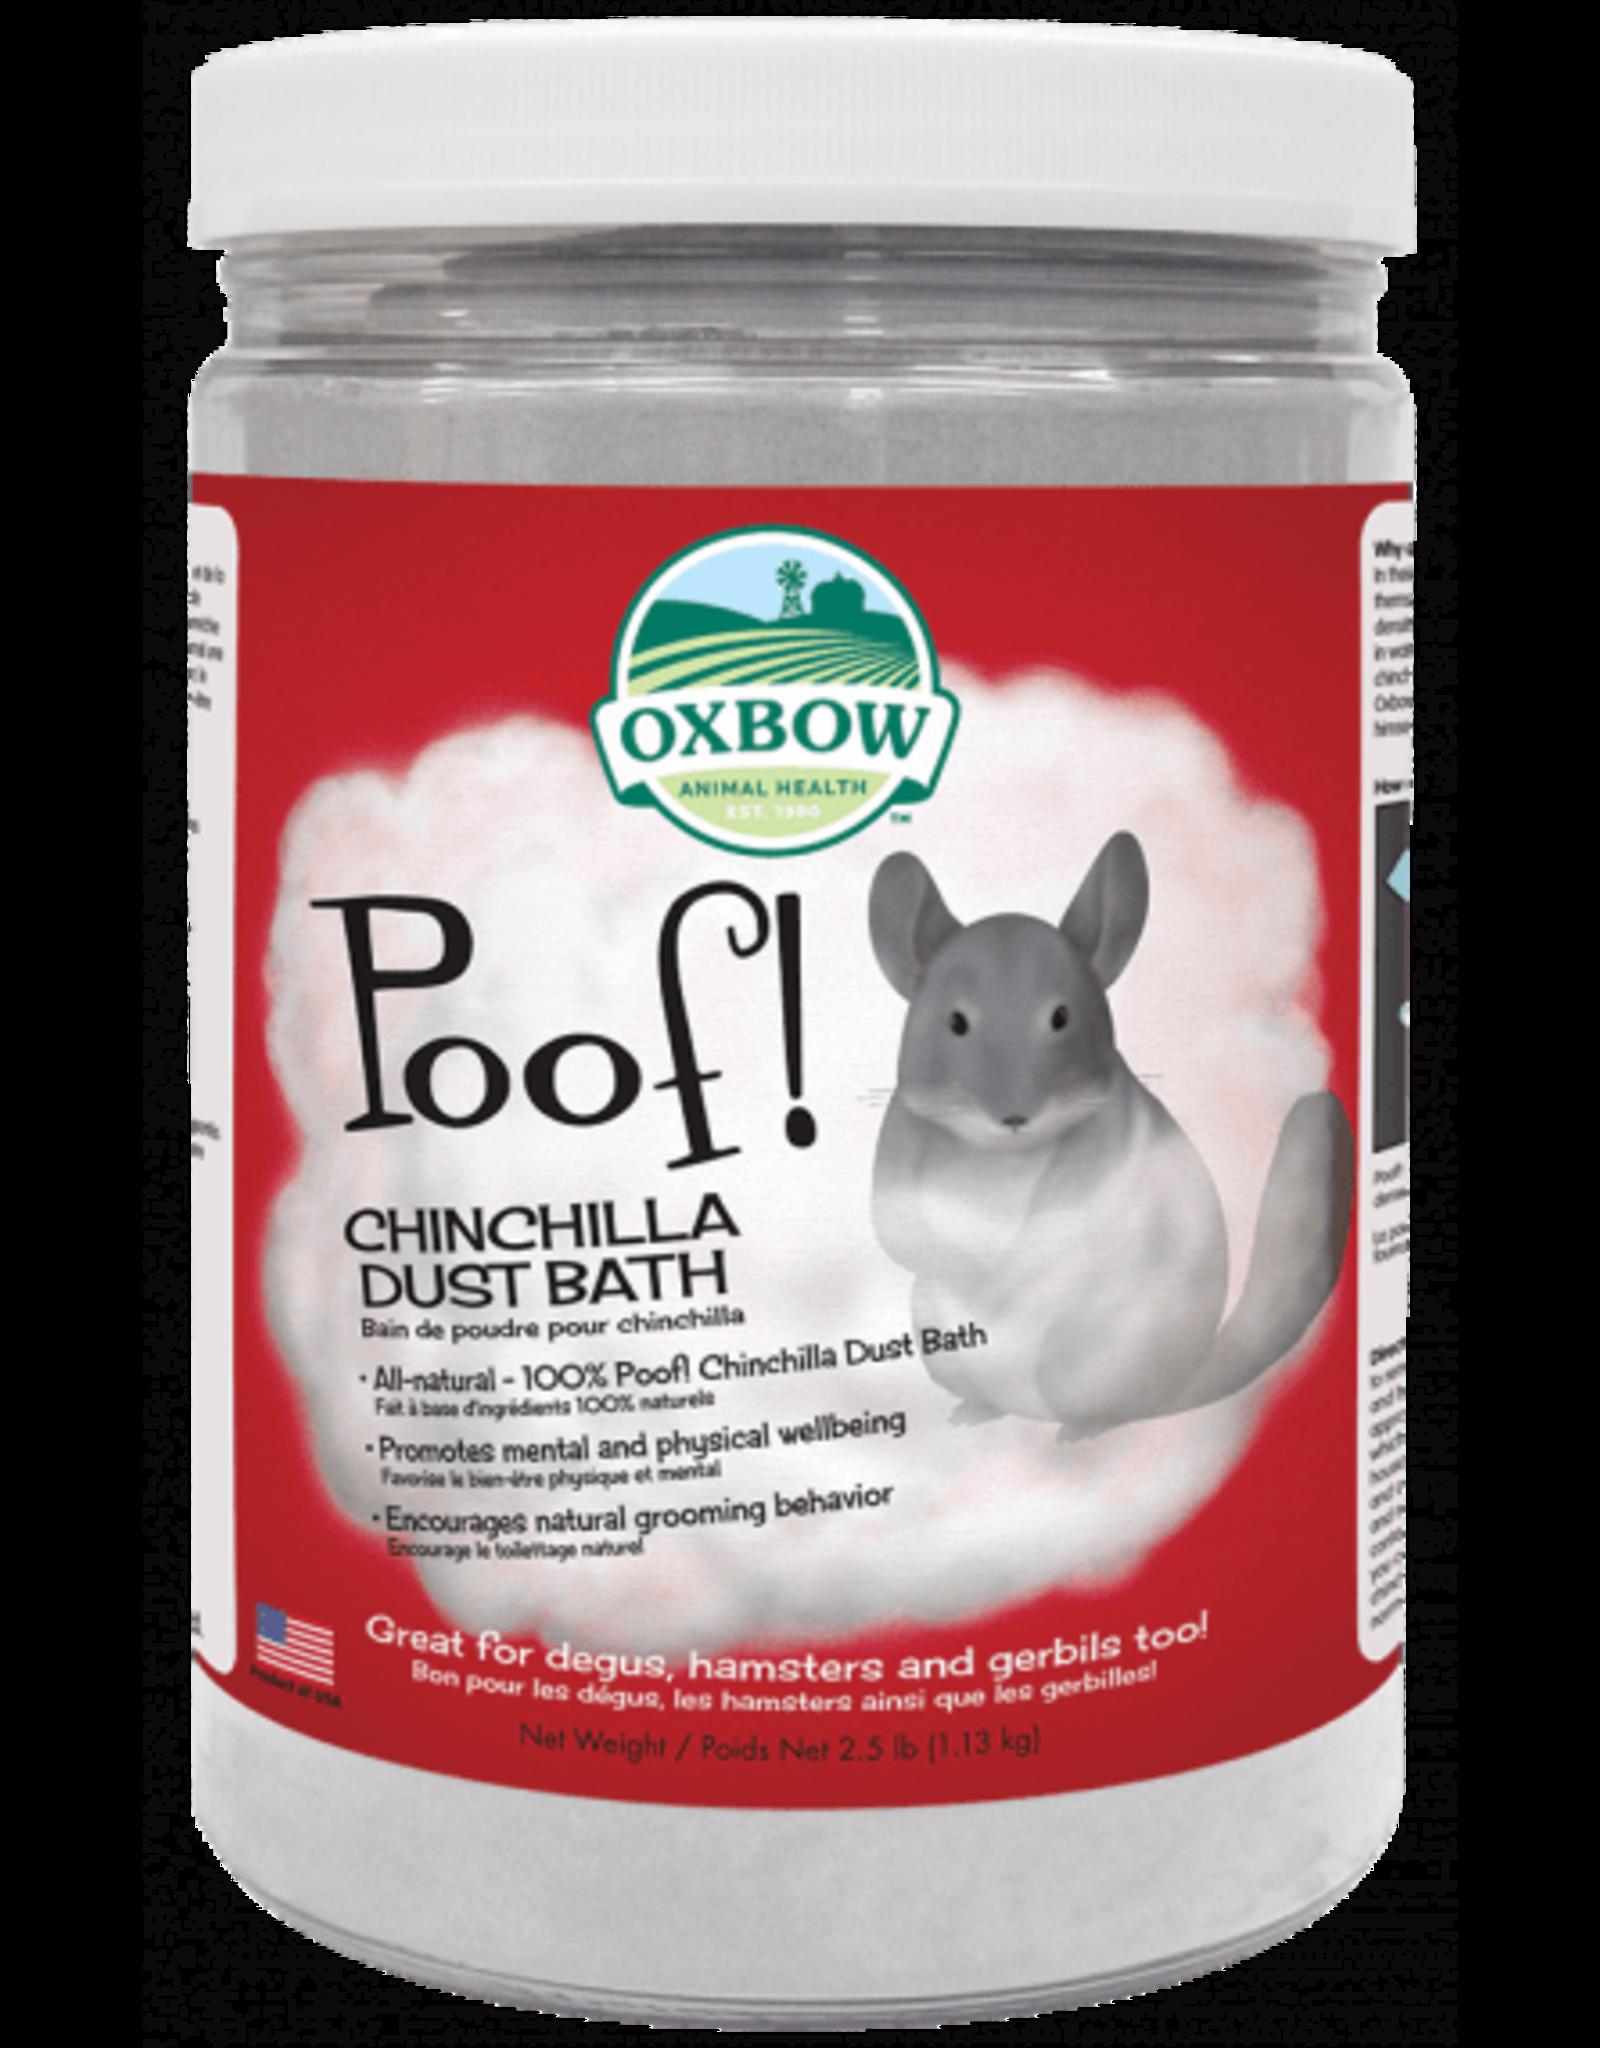 Oxbow OXBOW Poof! Chinchilla dust 2.5lbs